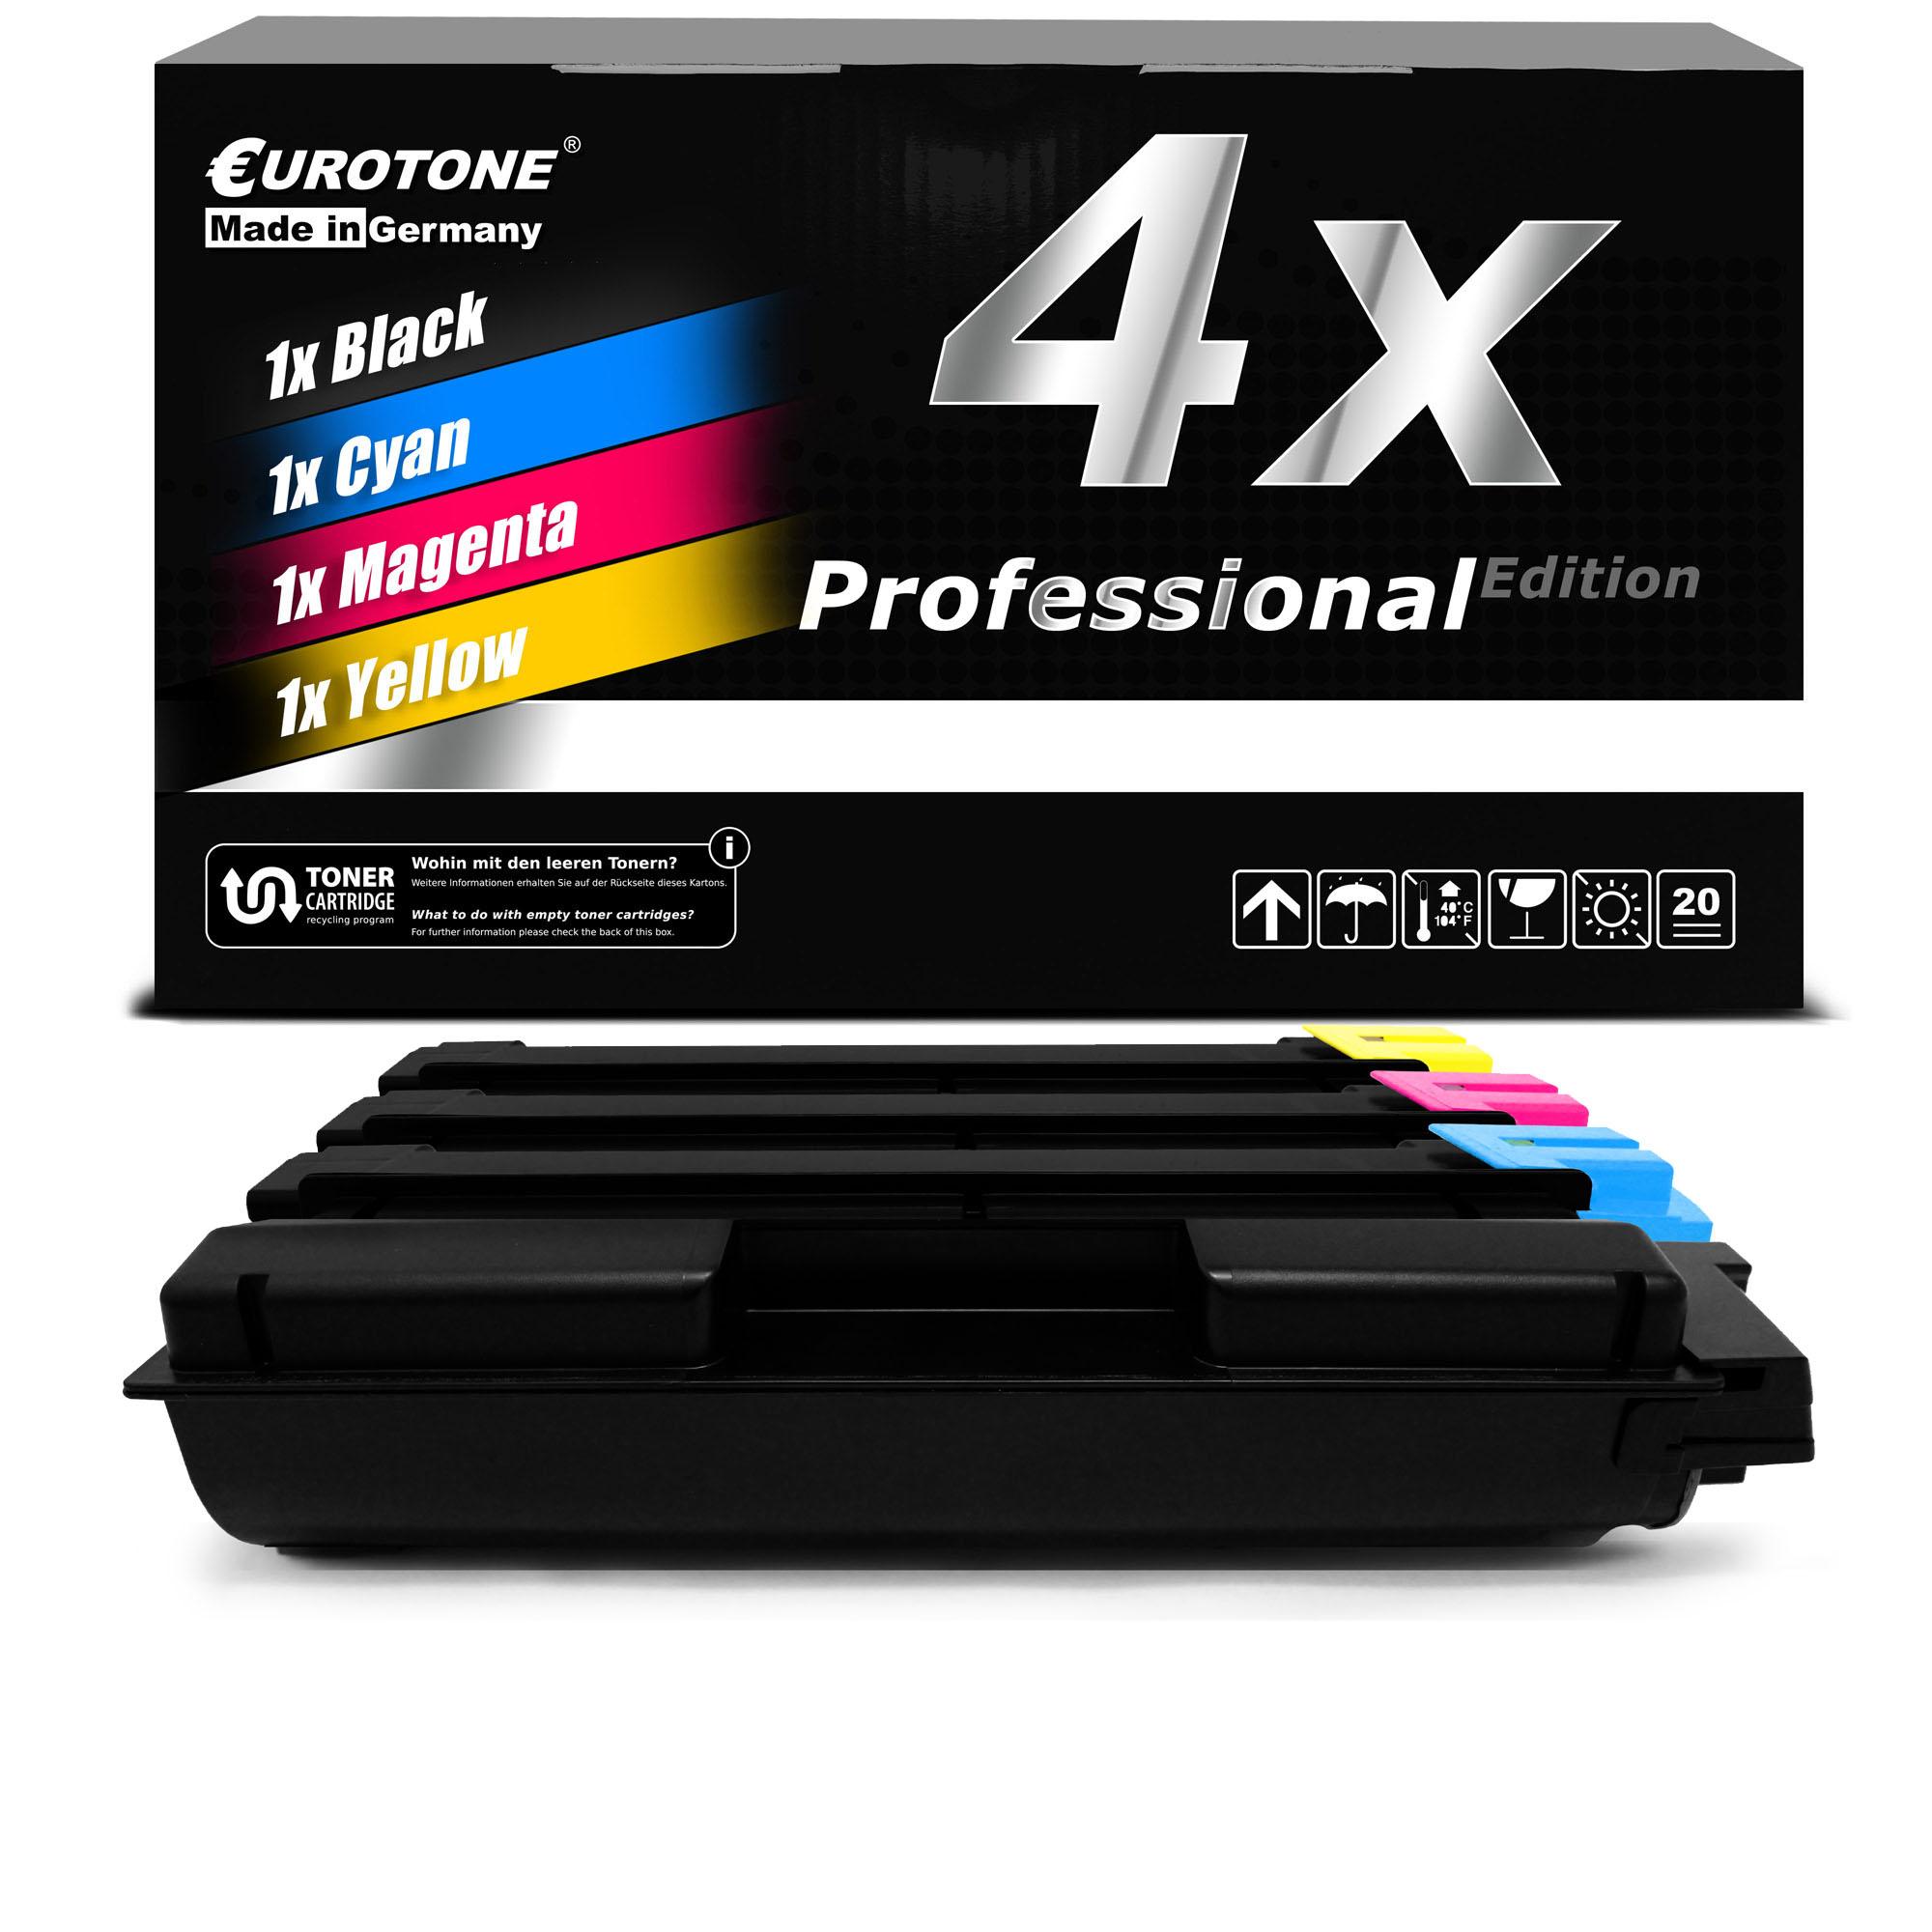 4x-eurotone-Pro-Cartouche-remplace-Kyocera-TK-5140-C-TK-5140-K-TK-5140-M-TK-5140-Y